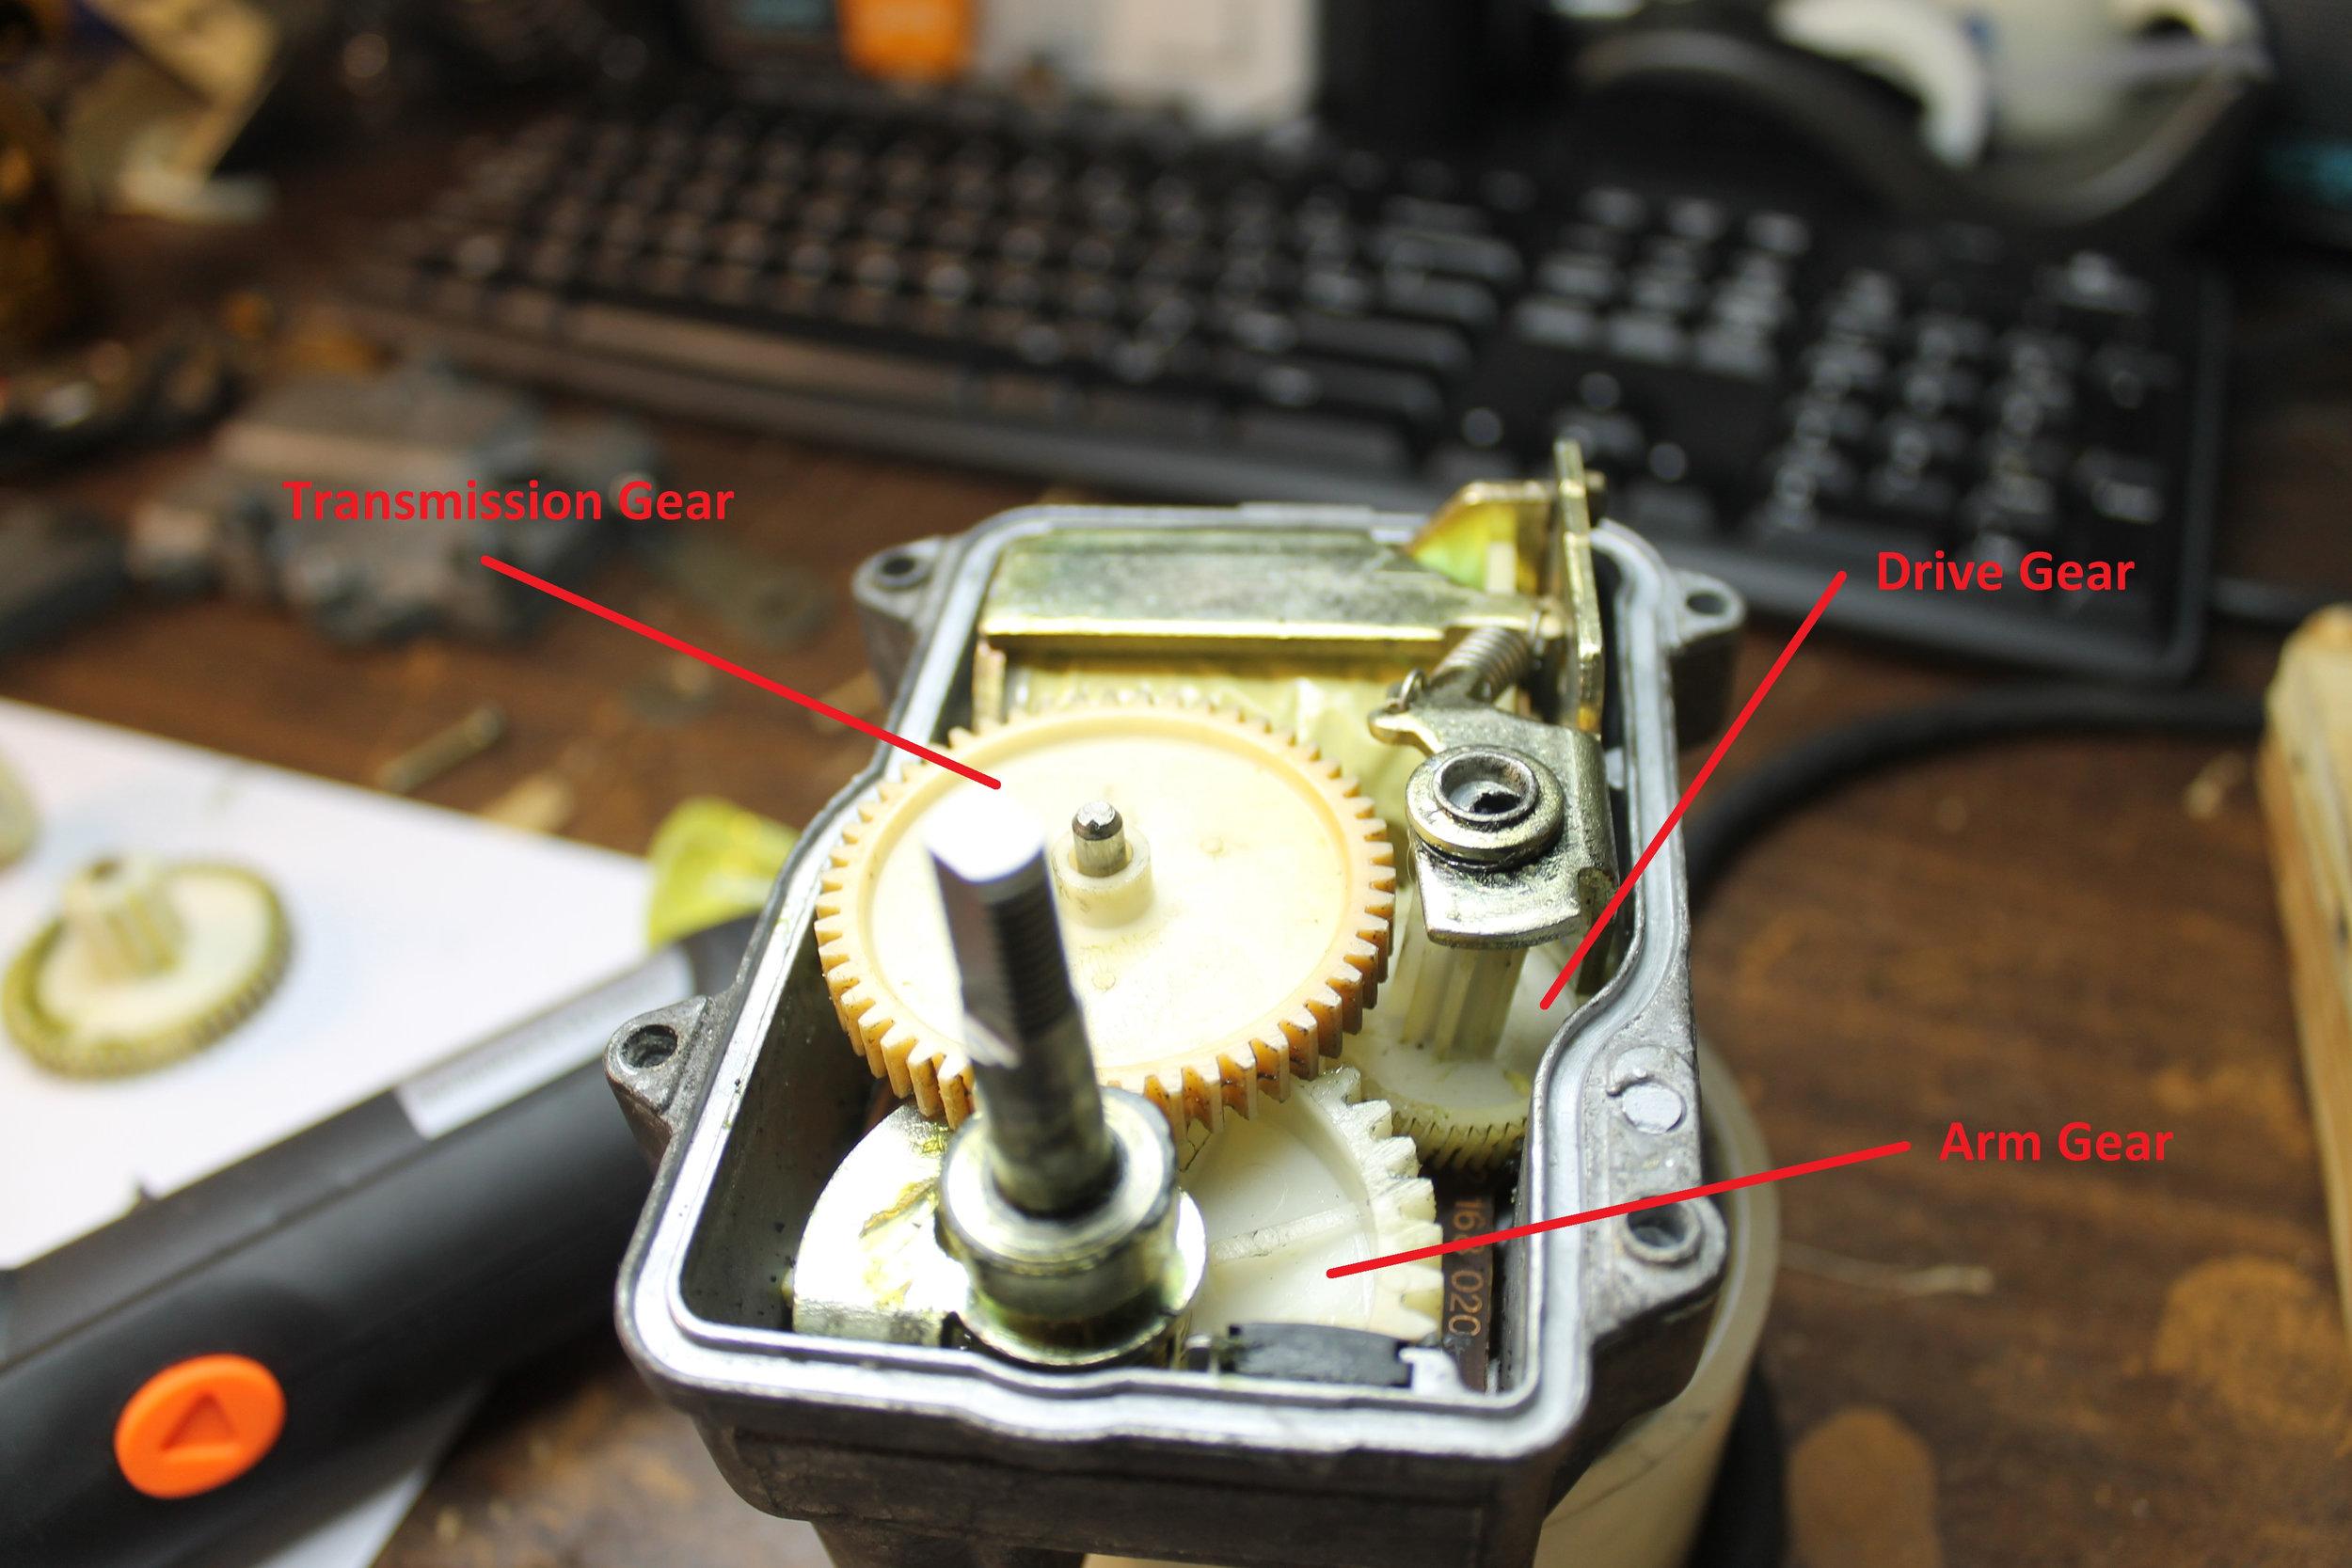 Actuator - Gears